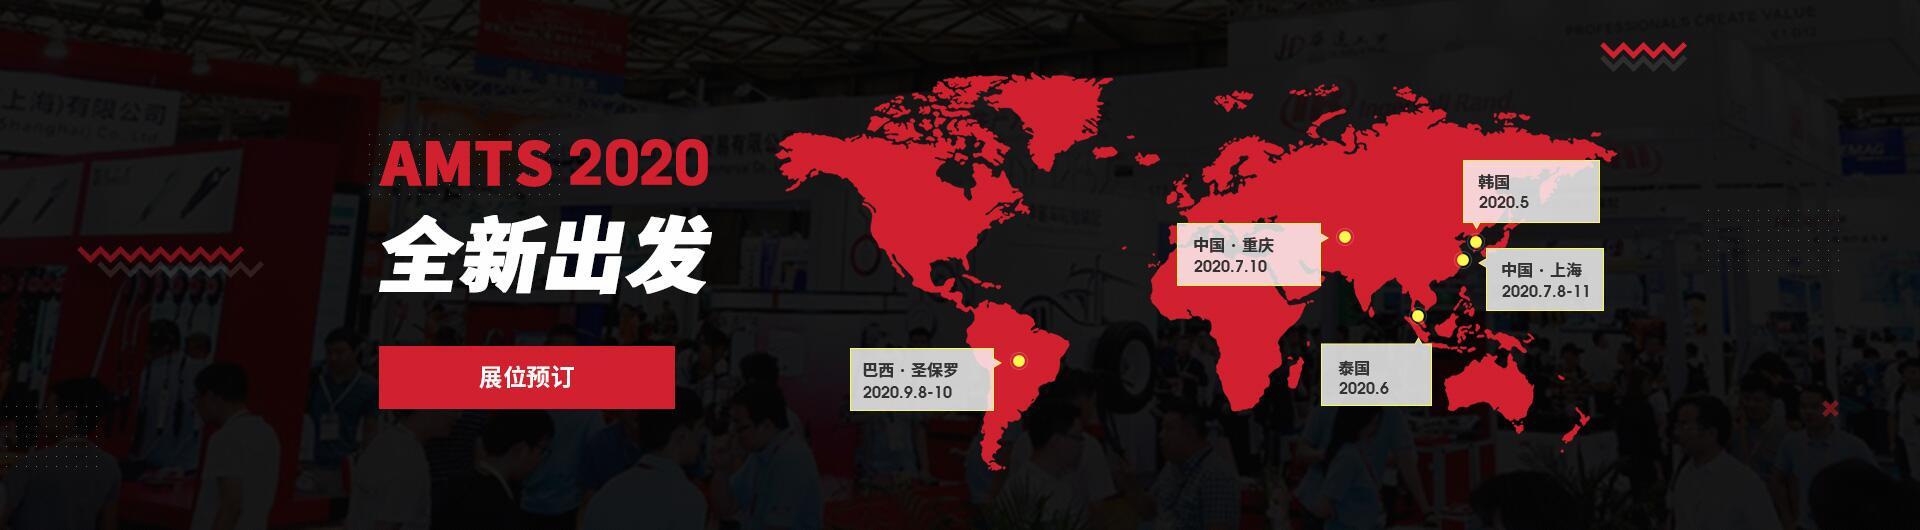 AMTS 2020 全球布局